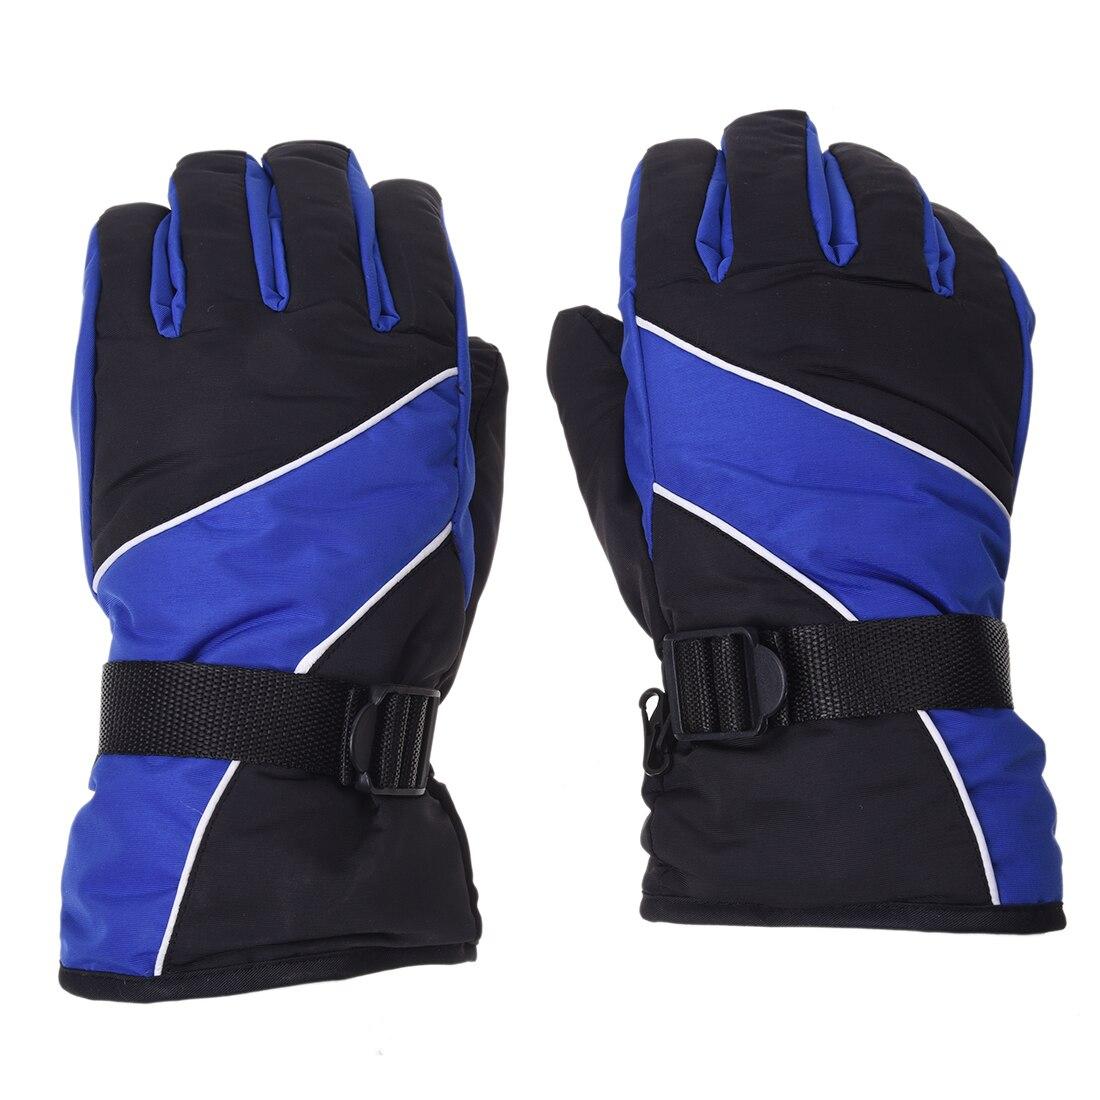 Men Ski Gloves Thermal Waterproof For Winter Outdoor Sports Snowboard